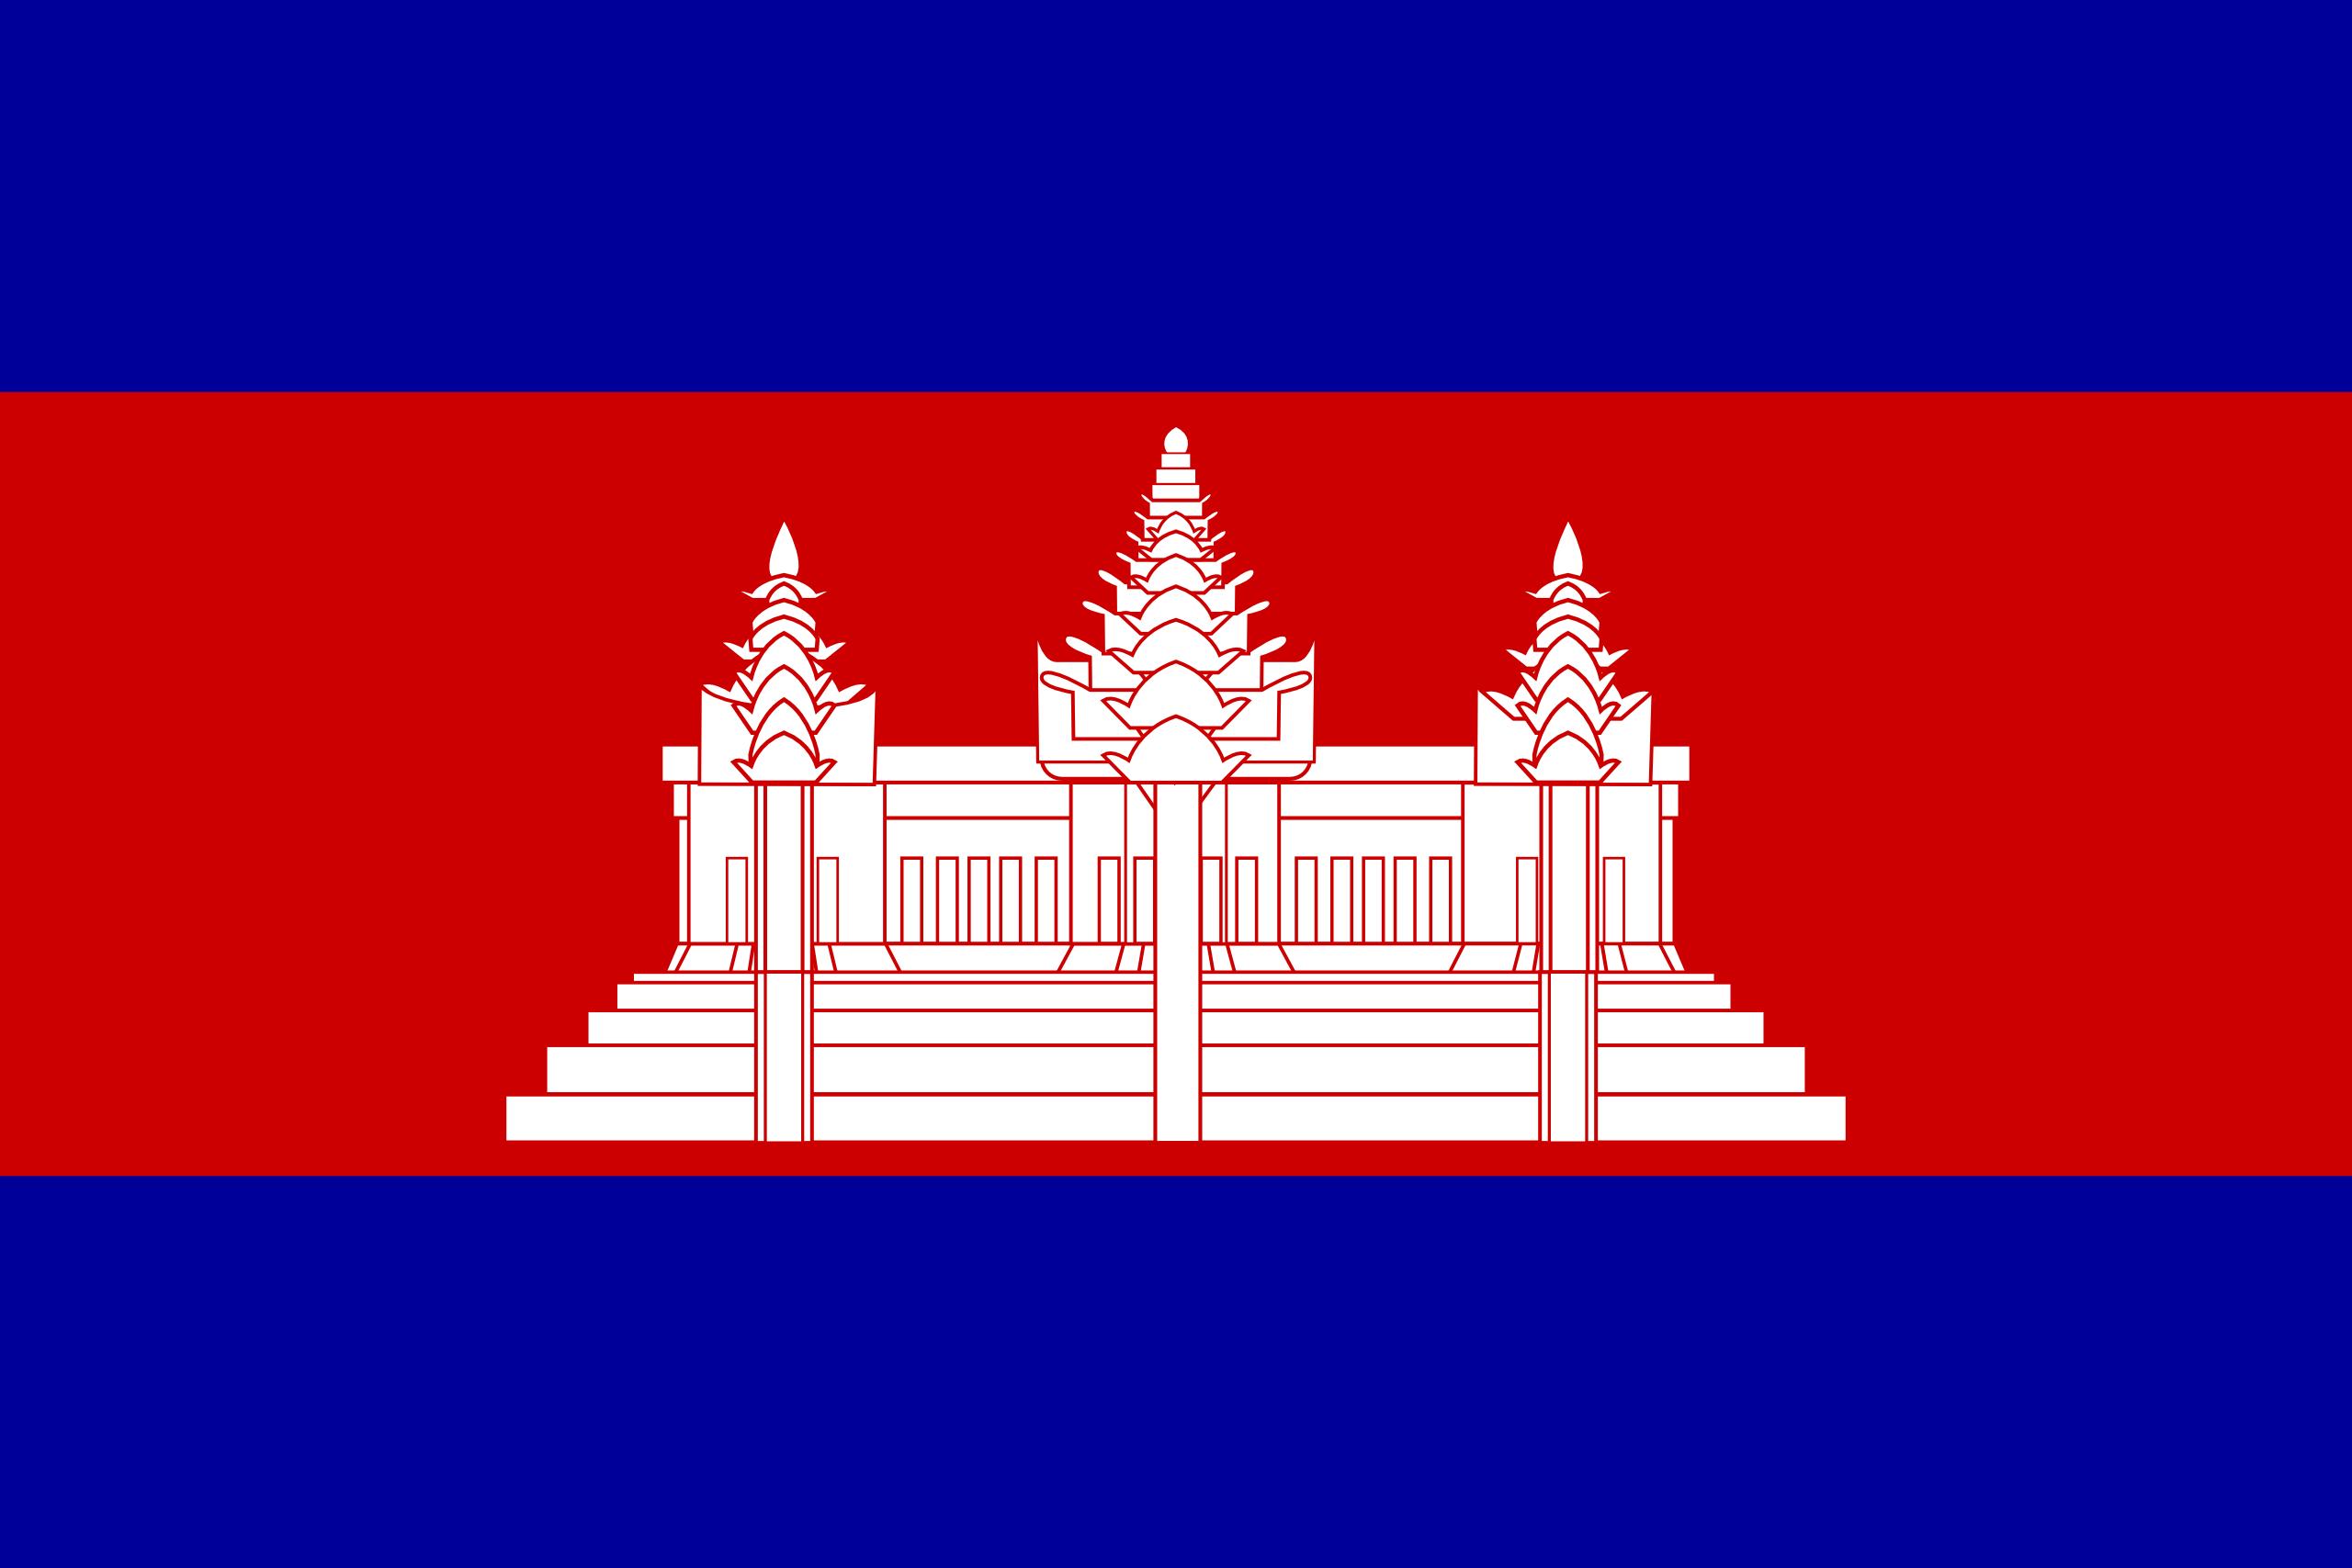 Камбоджа, país, emblema, insignia, символ - Обои HD - Профессор falken.com